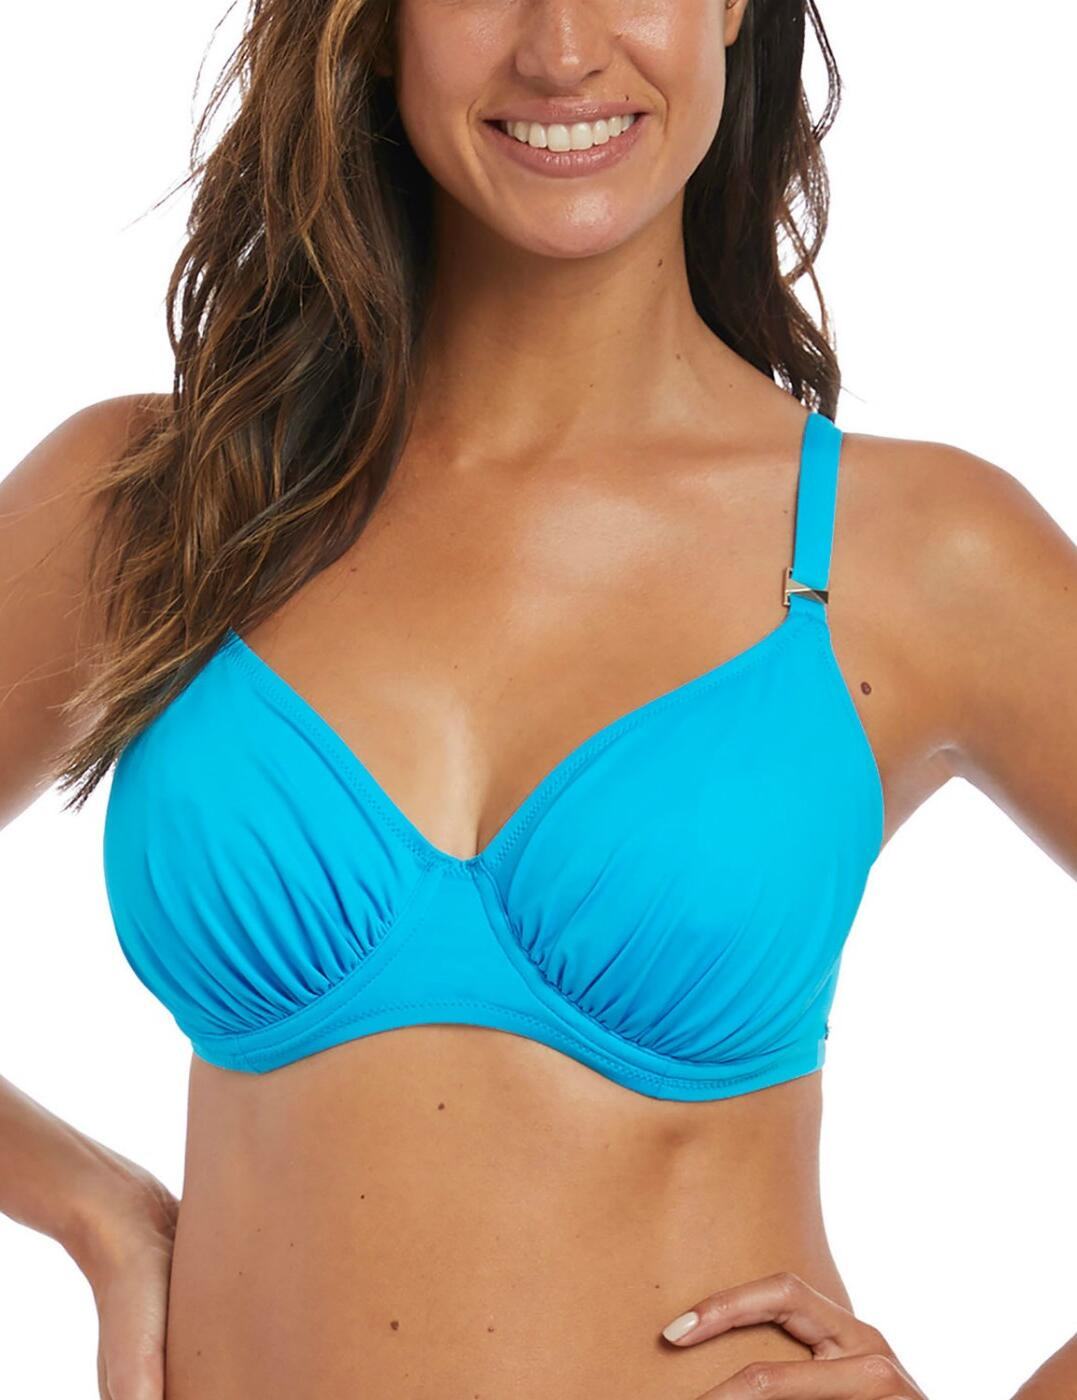 6549 Fantasie Paradise Bay Gathered Full Cup Bikini Top - 6549 Aqua